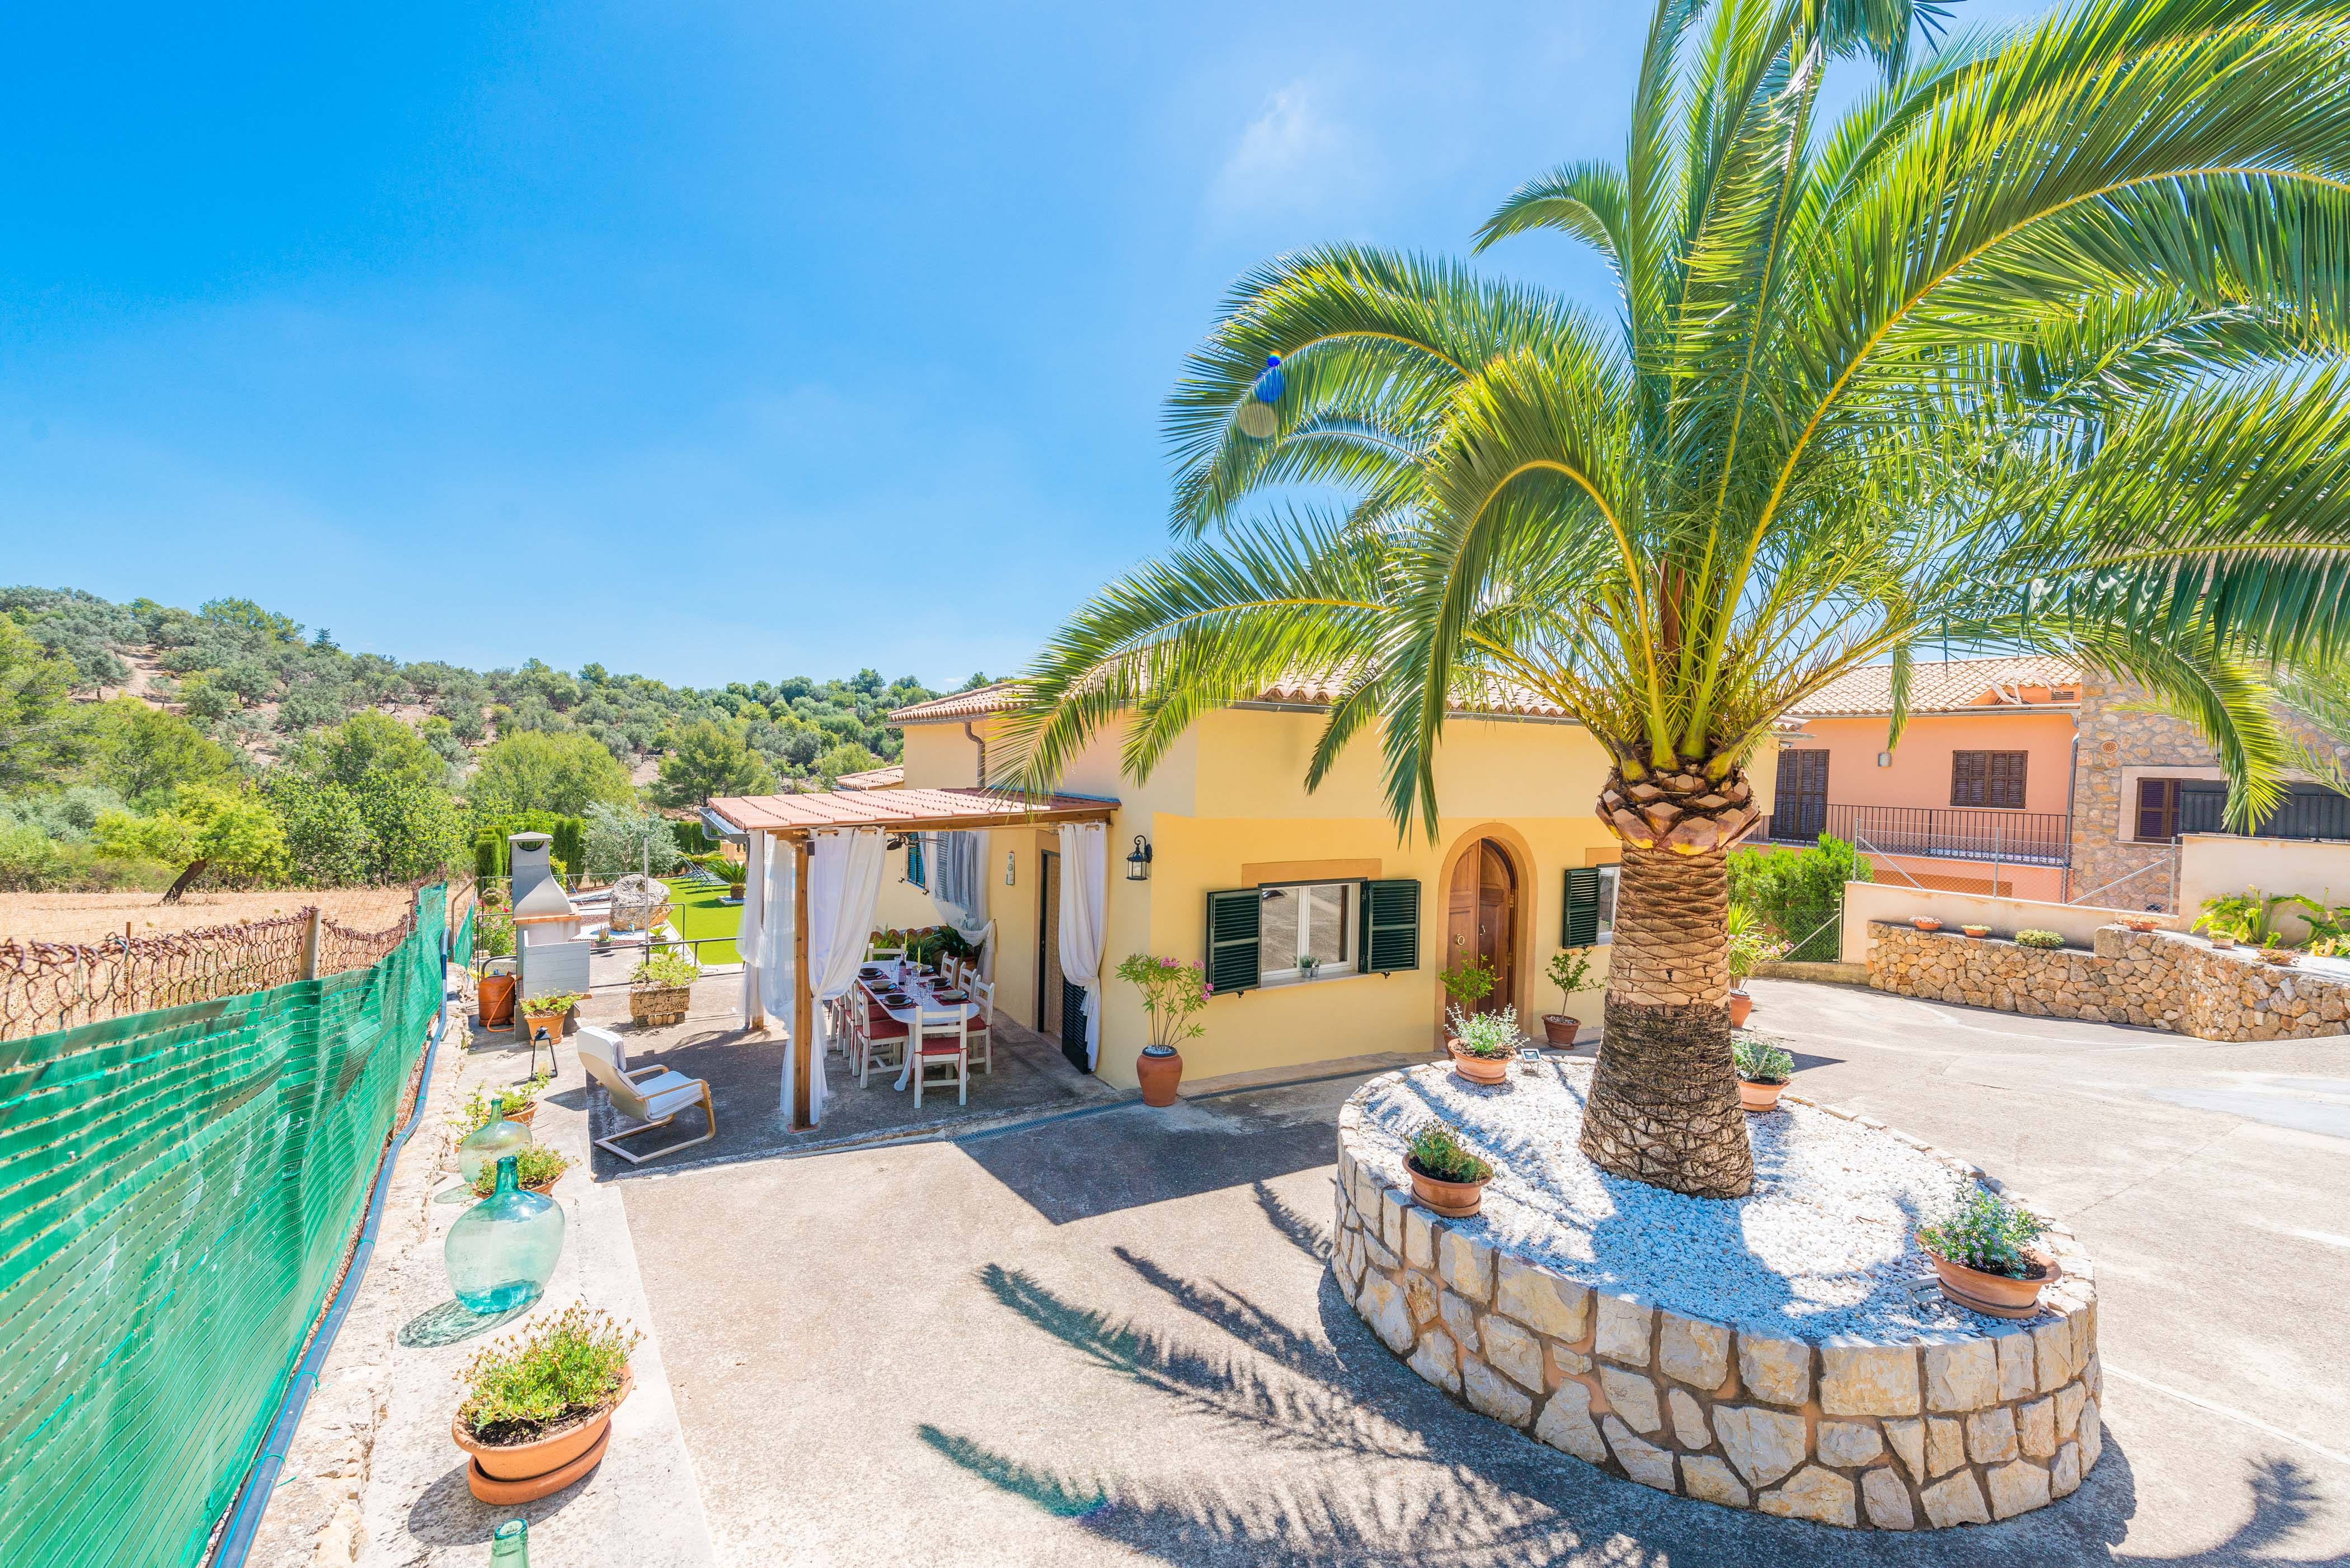 Ferienhaus SA TANCA (MANCORINA) (2037553), Mancor de la Vall, Mallorca, Balearische Inseln, Spanien, Bild 34